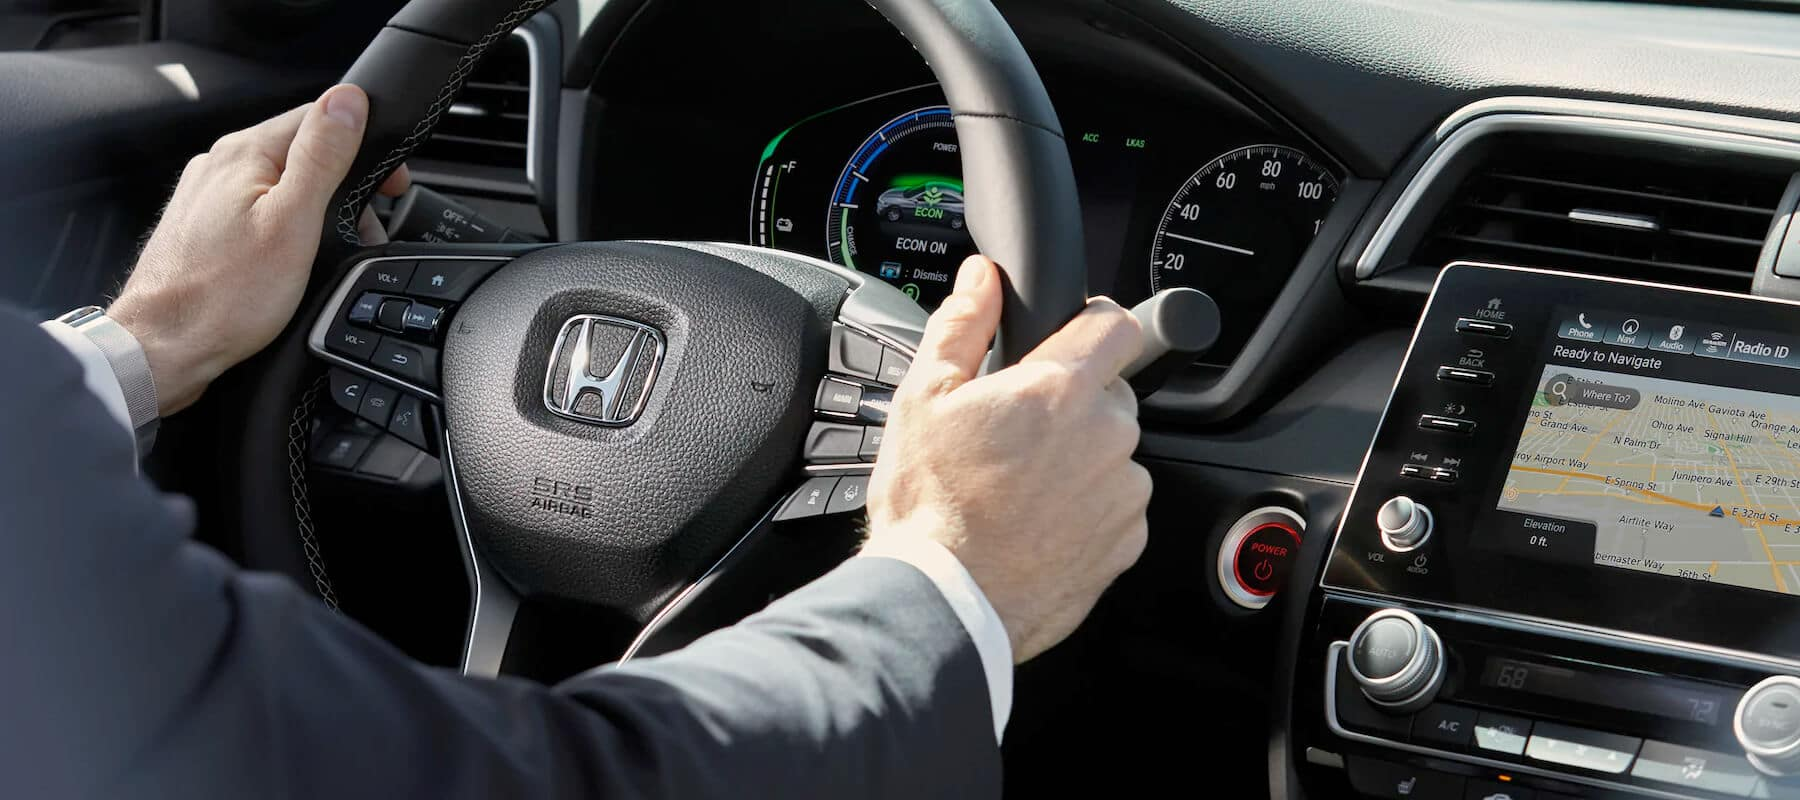 Honda Dealership in Sioux Falls, South Dakota